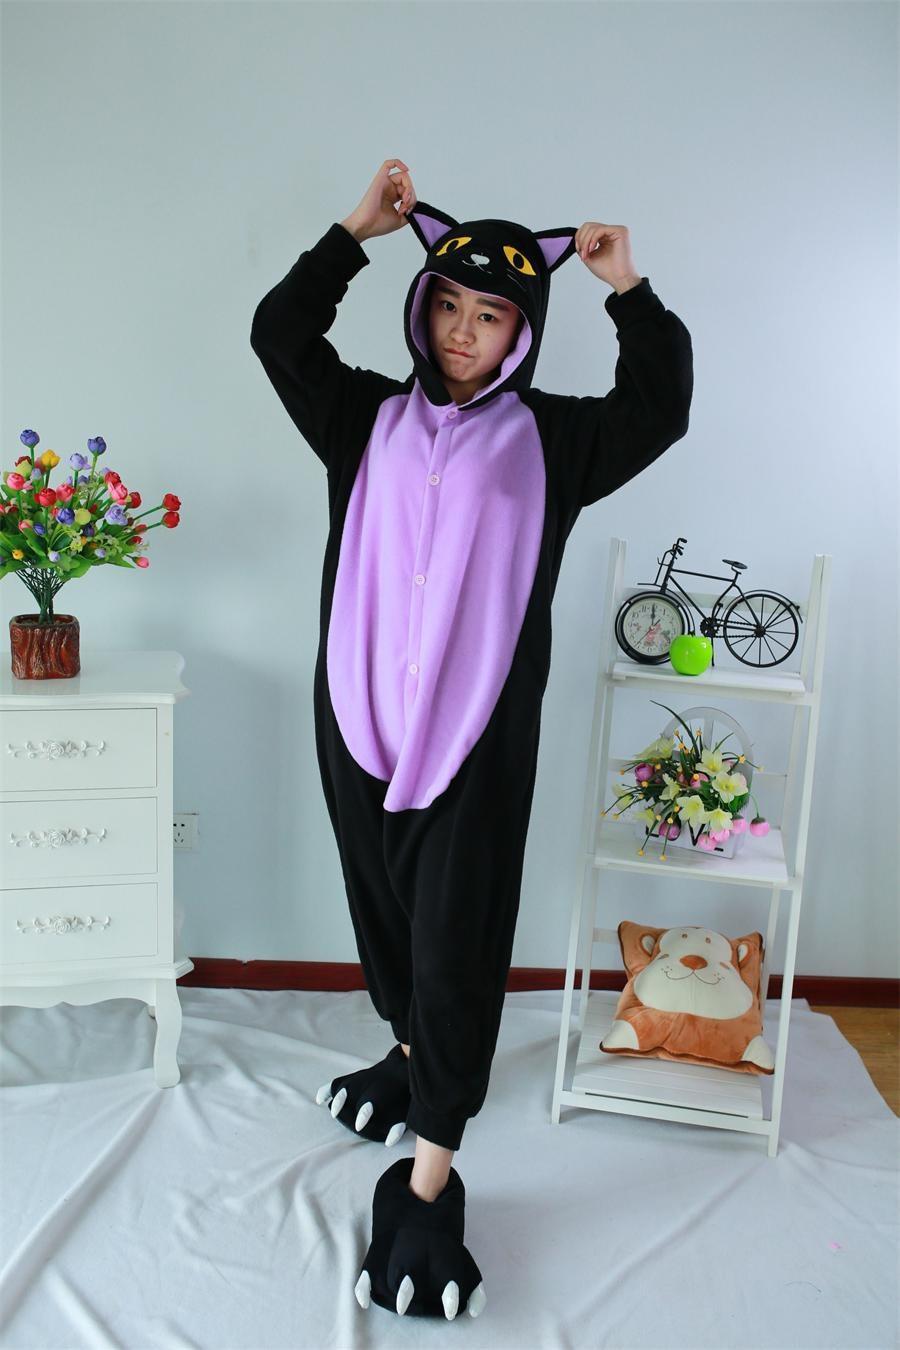 Midnight Cat Onesie Anime Cosplay Piyama Dewasa Hewan Kucing Hitam Onesie Pakaian Tidur Sleepsuit untuk Unisex